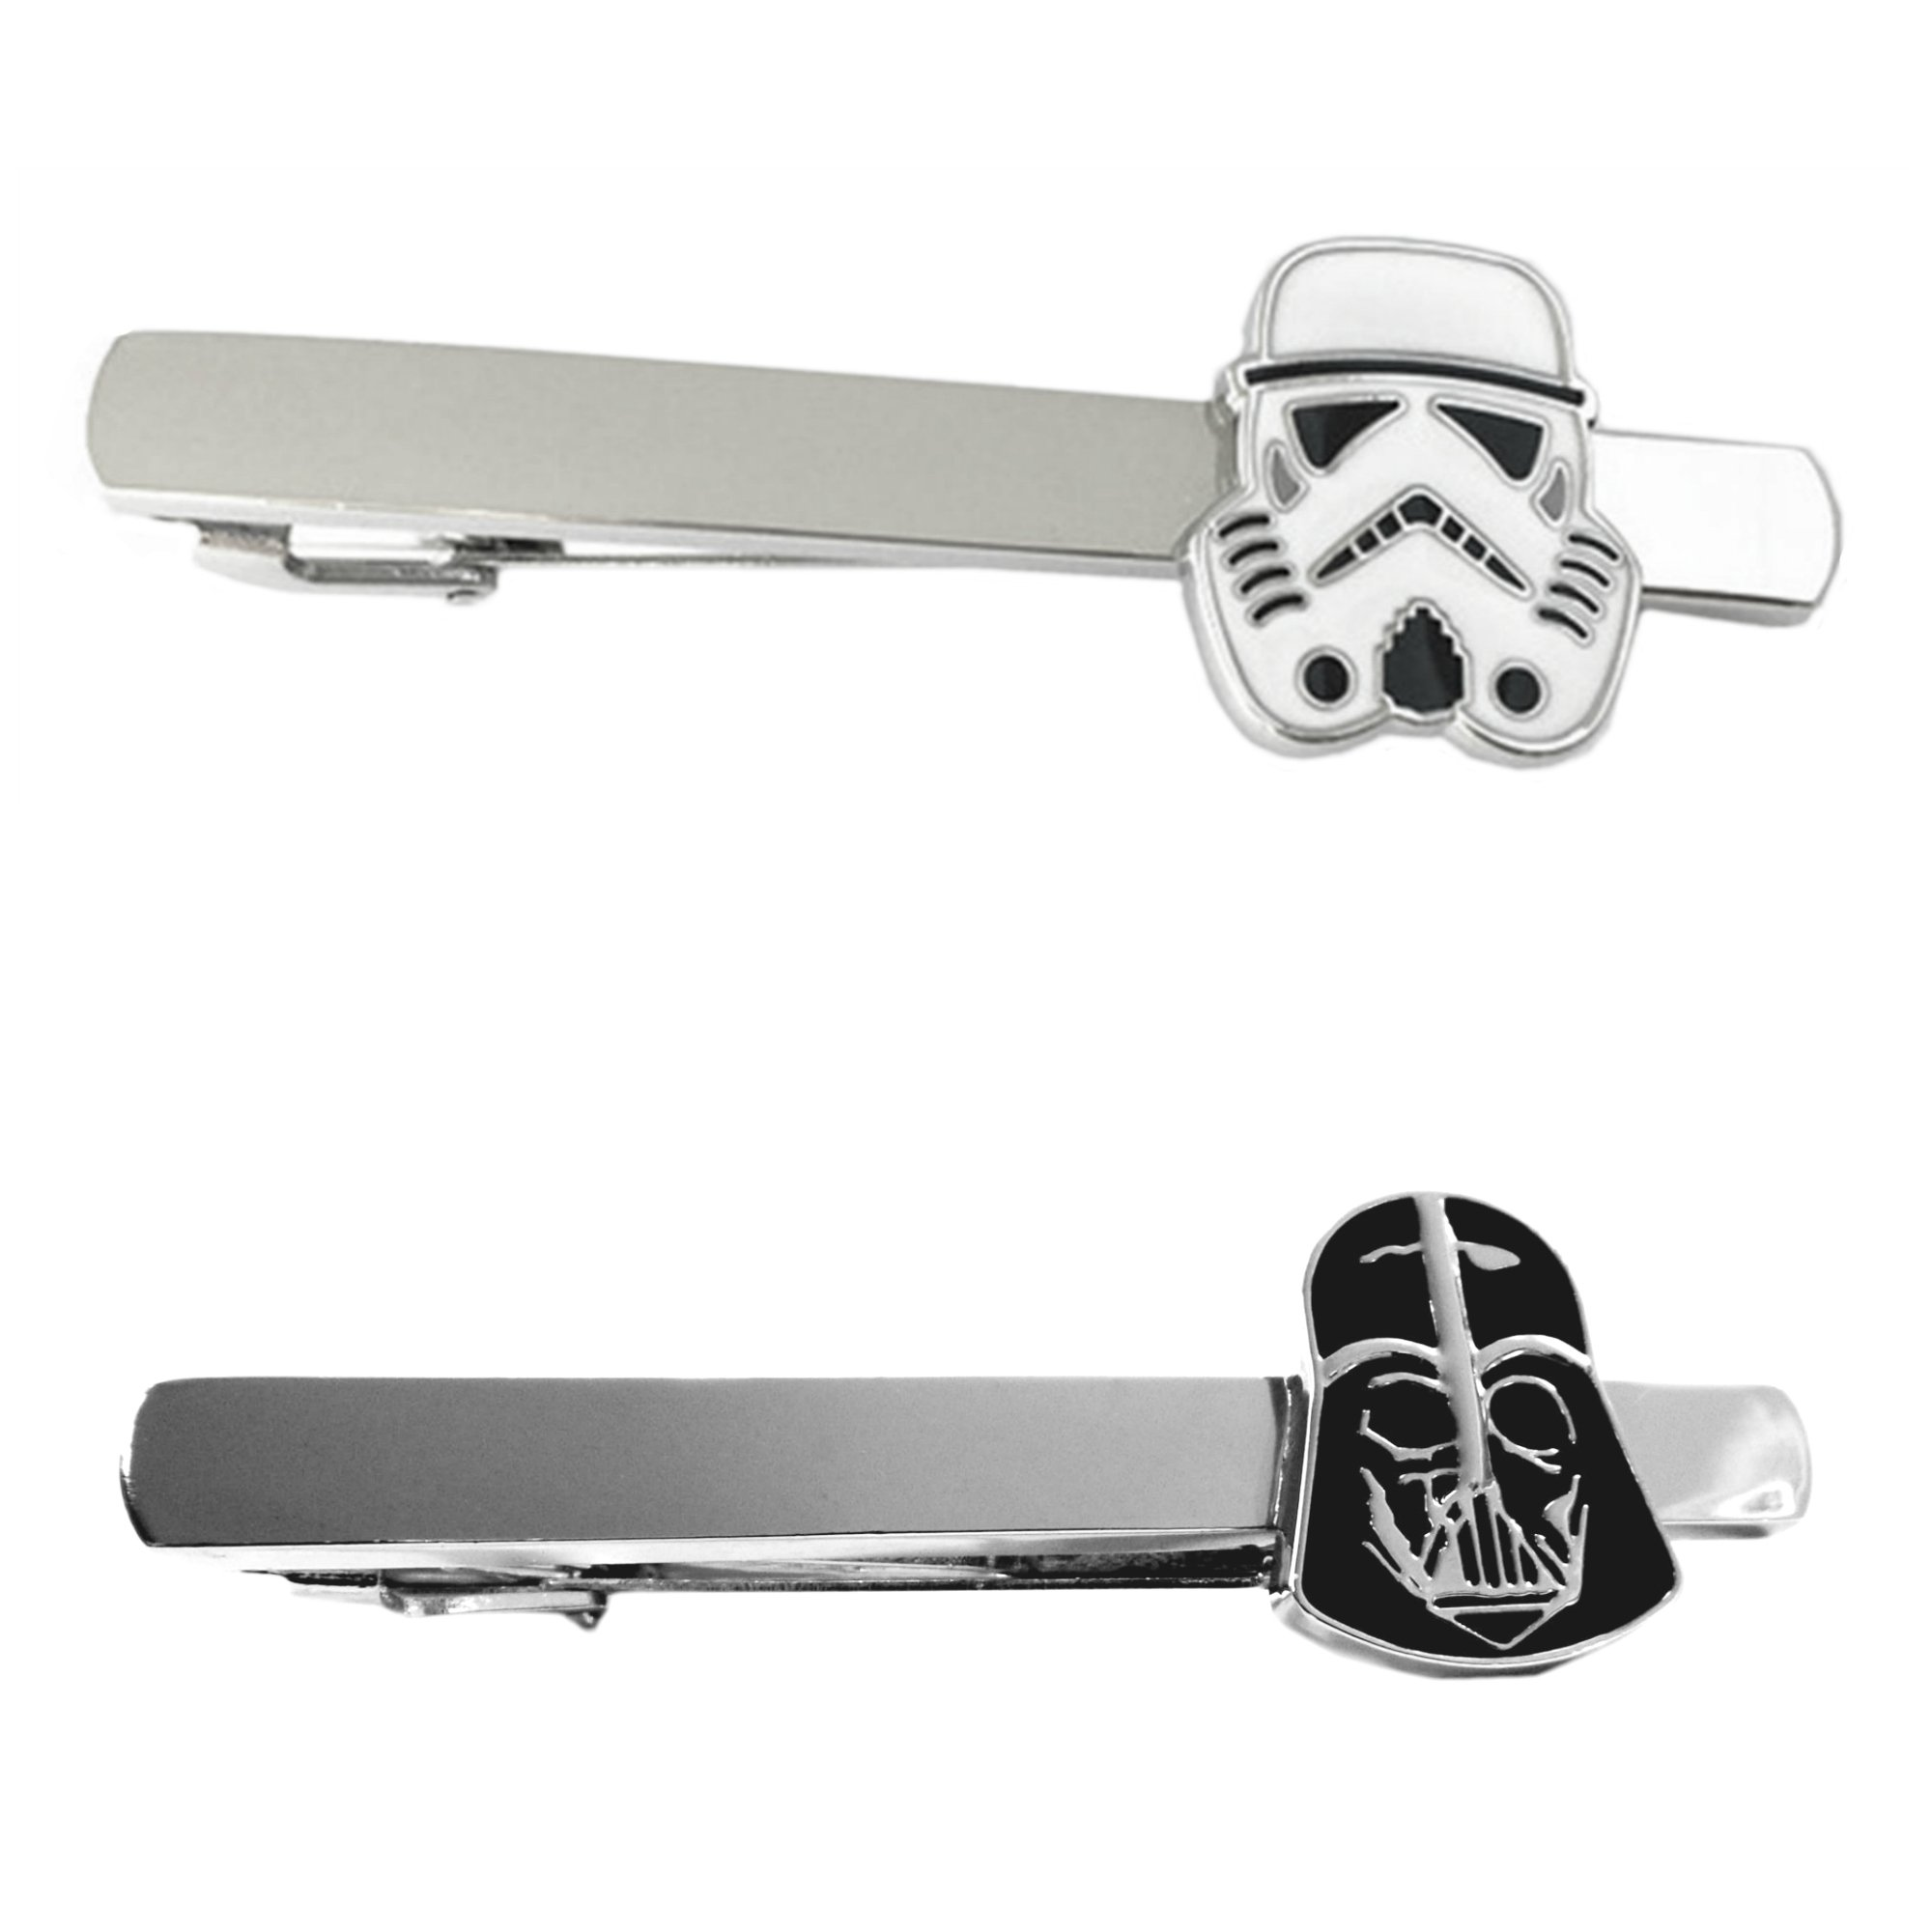 Outlander Star Wars - Storm Trooper & Darth Vader - Tiebar Tie Clasp Set of 2 Wedding Superhero Logo w/Gift Box